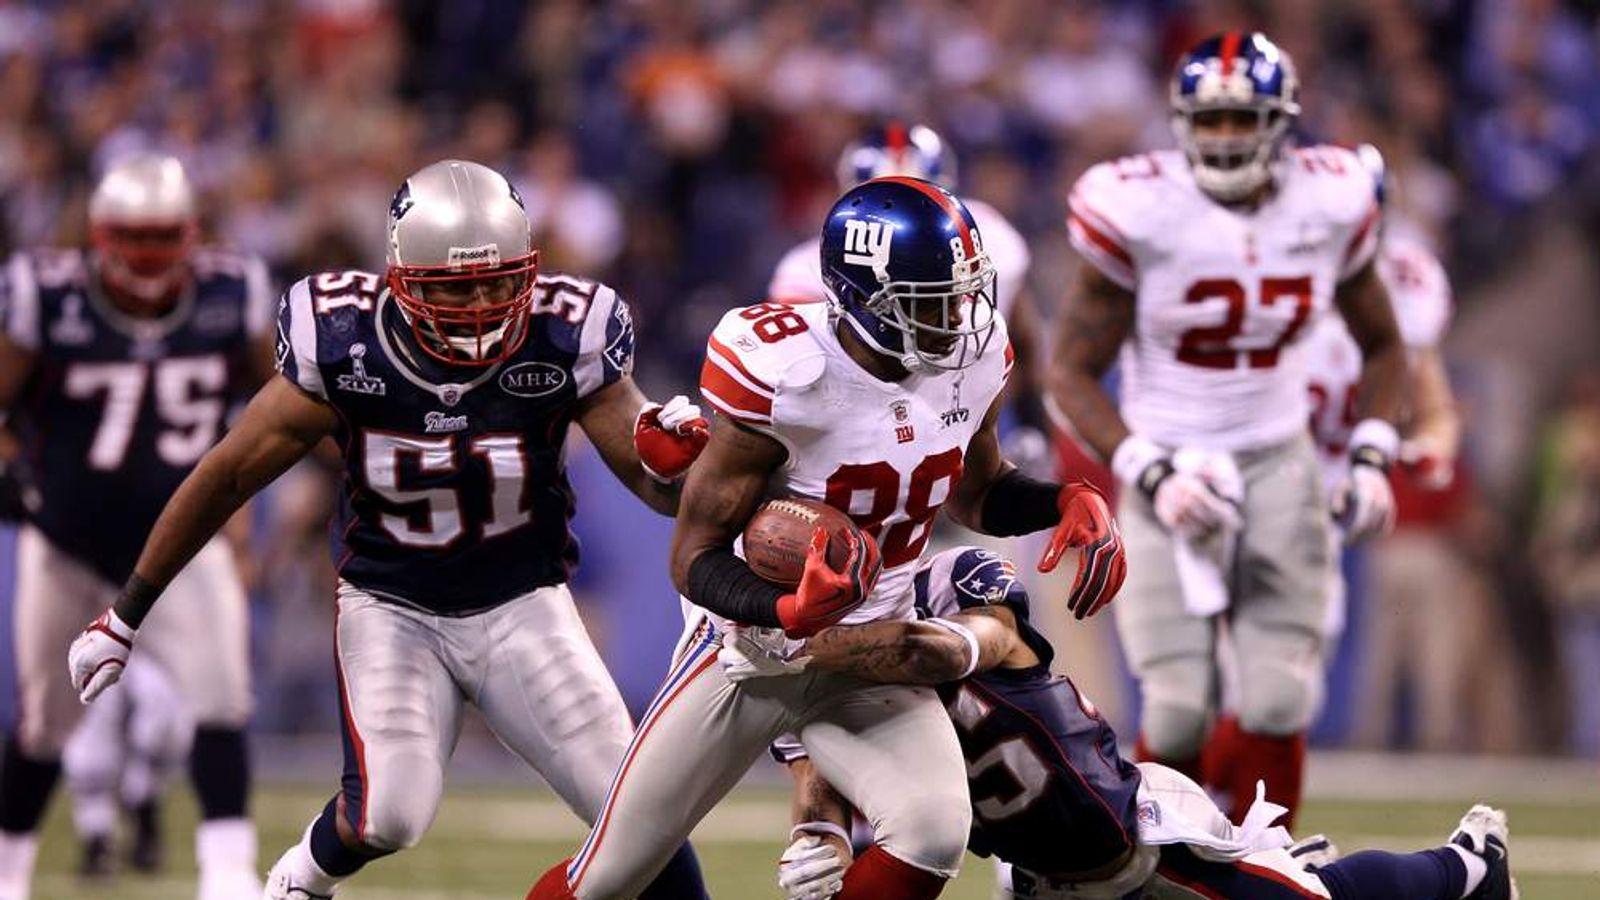 Hakeem Nicks of the New York Giants runs against the New England Patriots during Super Bowl XLVI